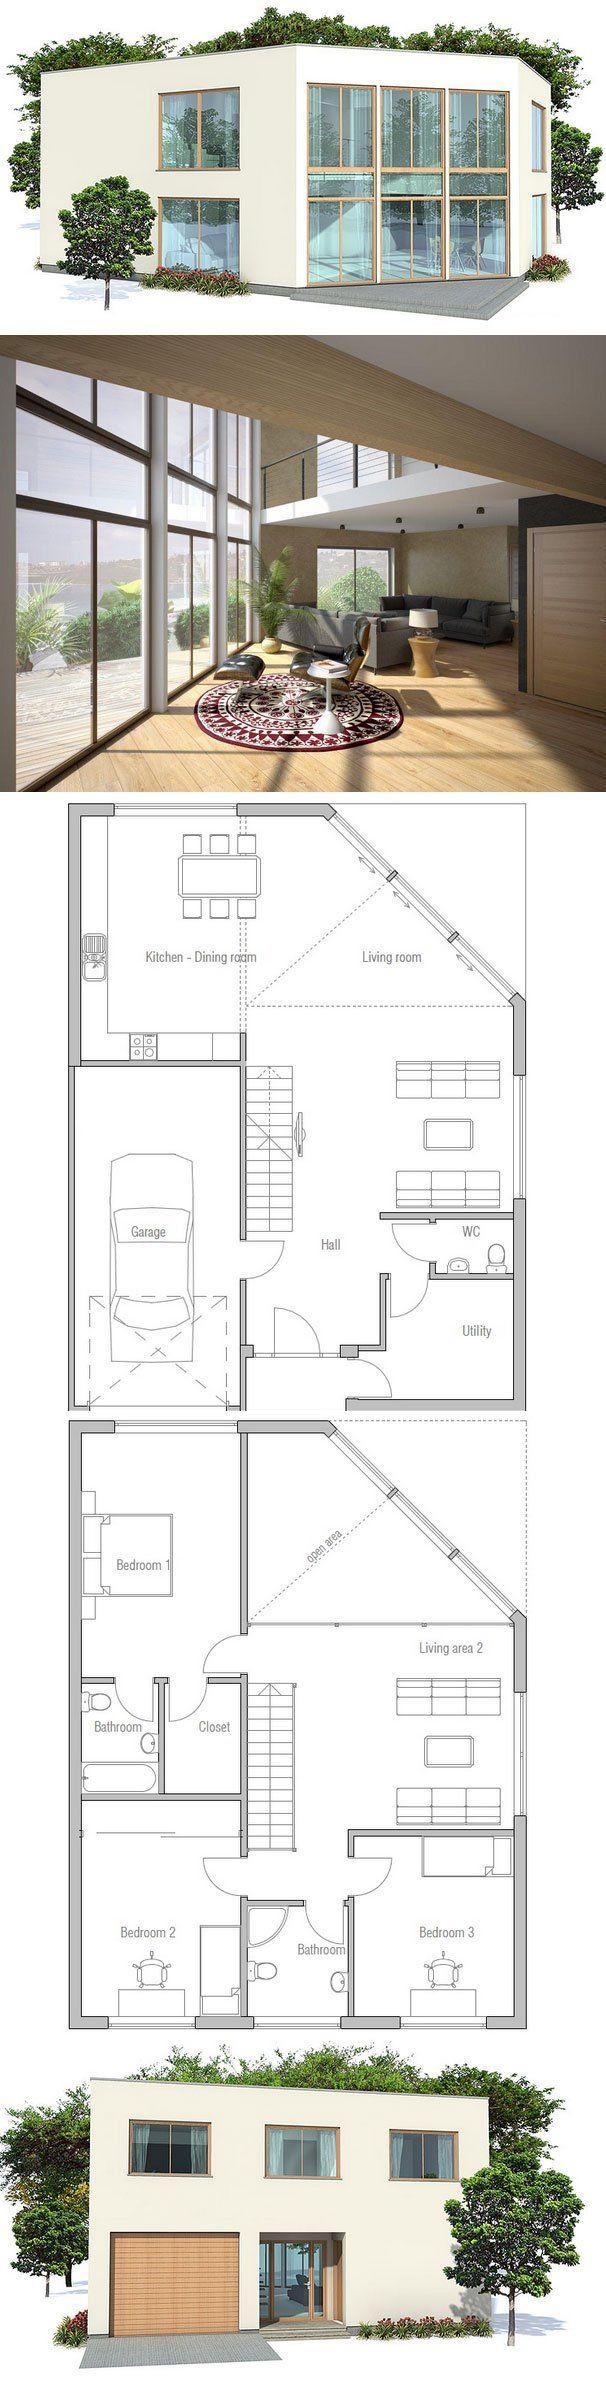 best 25 modern minimalist house ideas on pinterest minimalist modern minimalist house plan